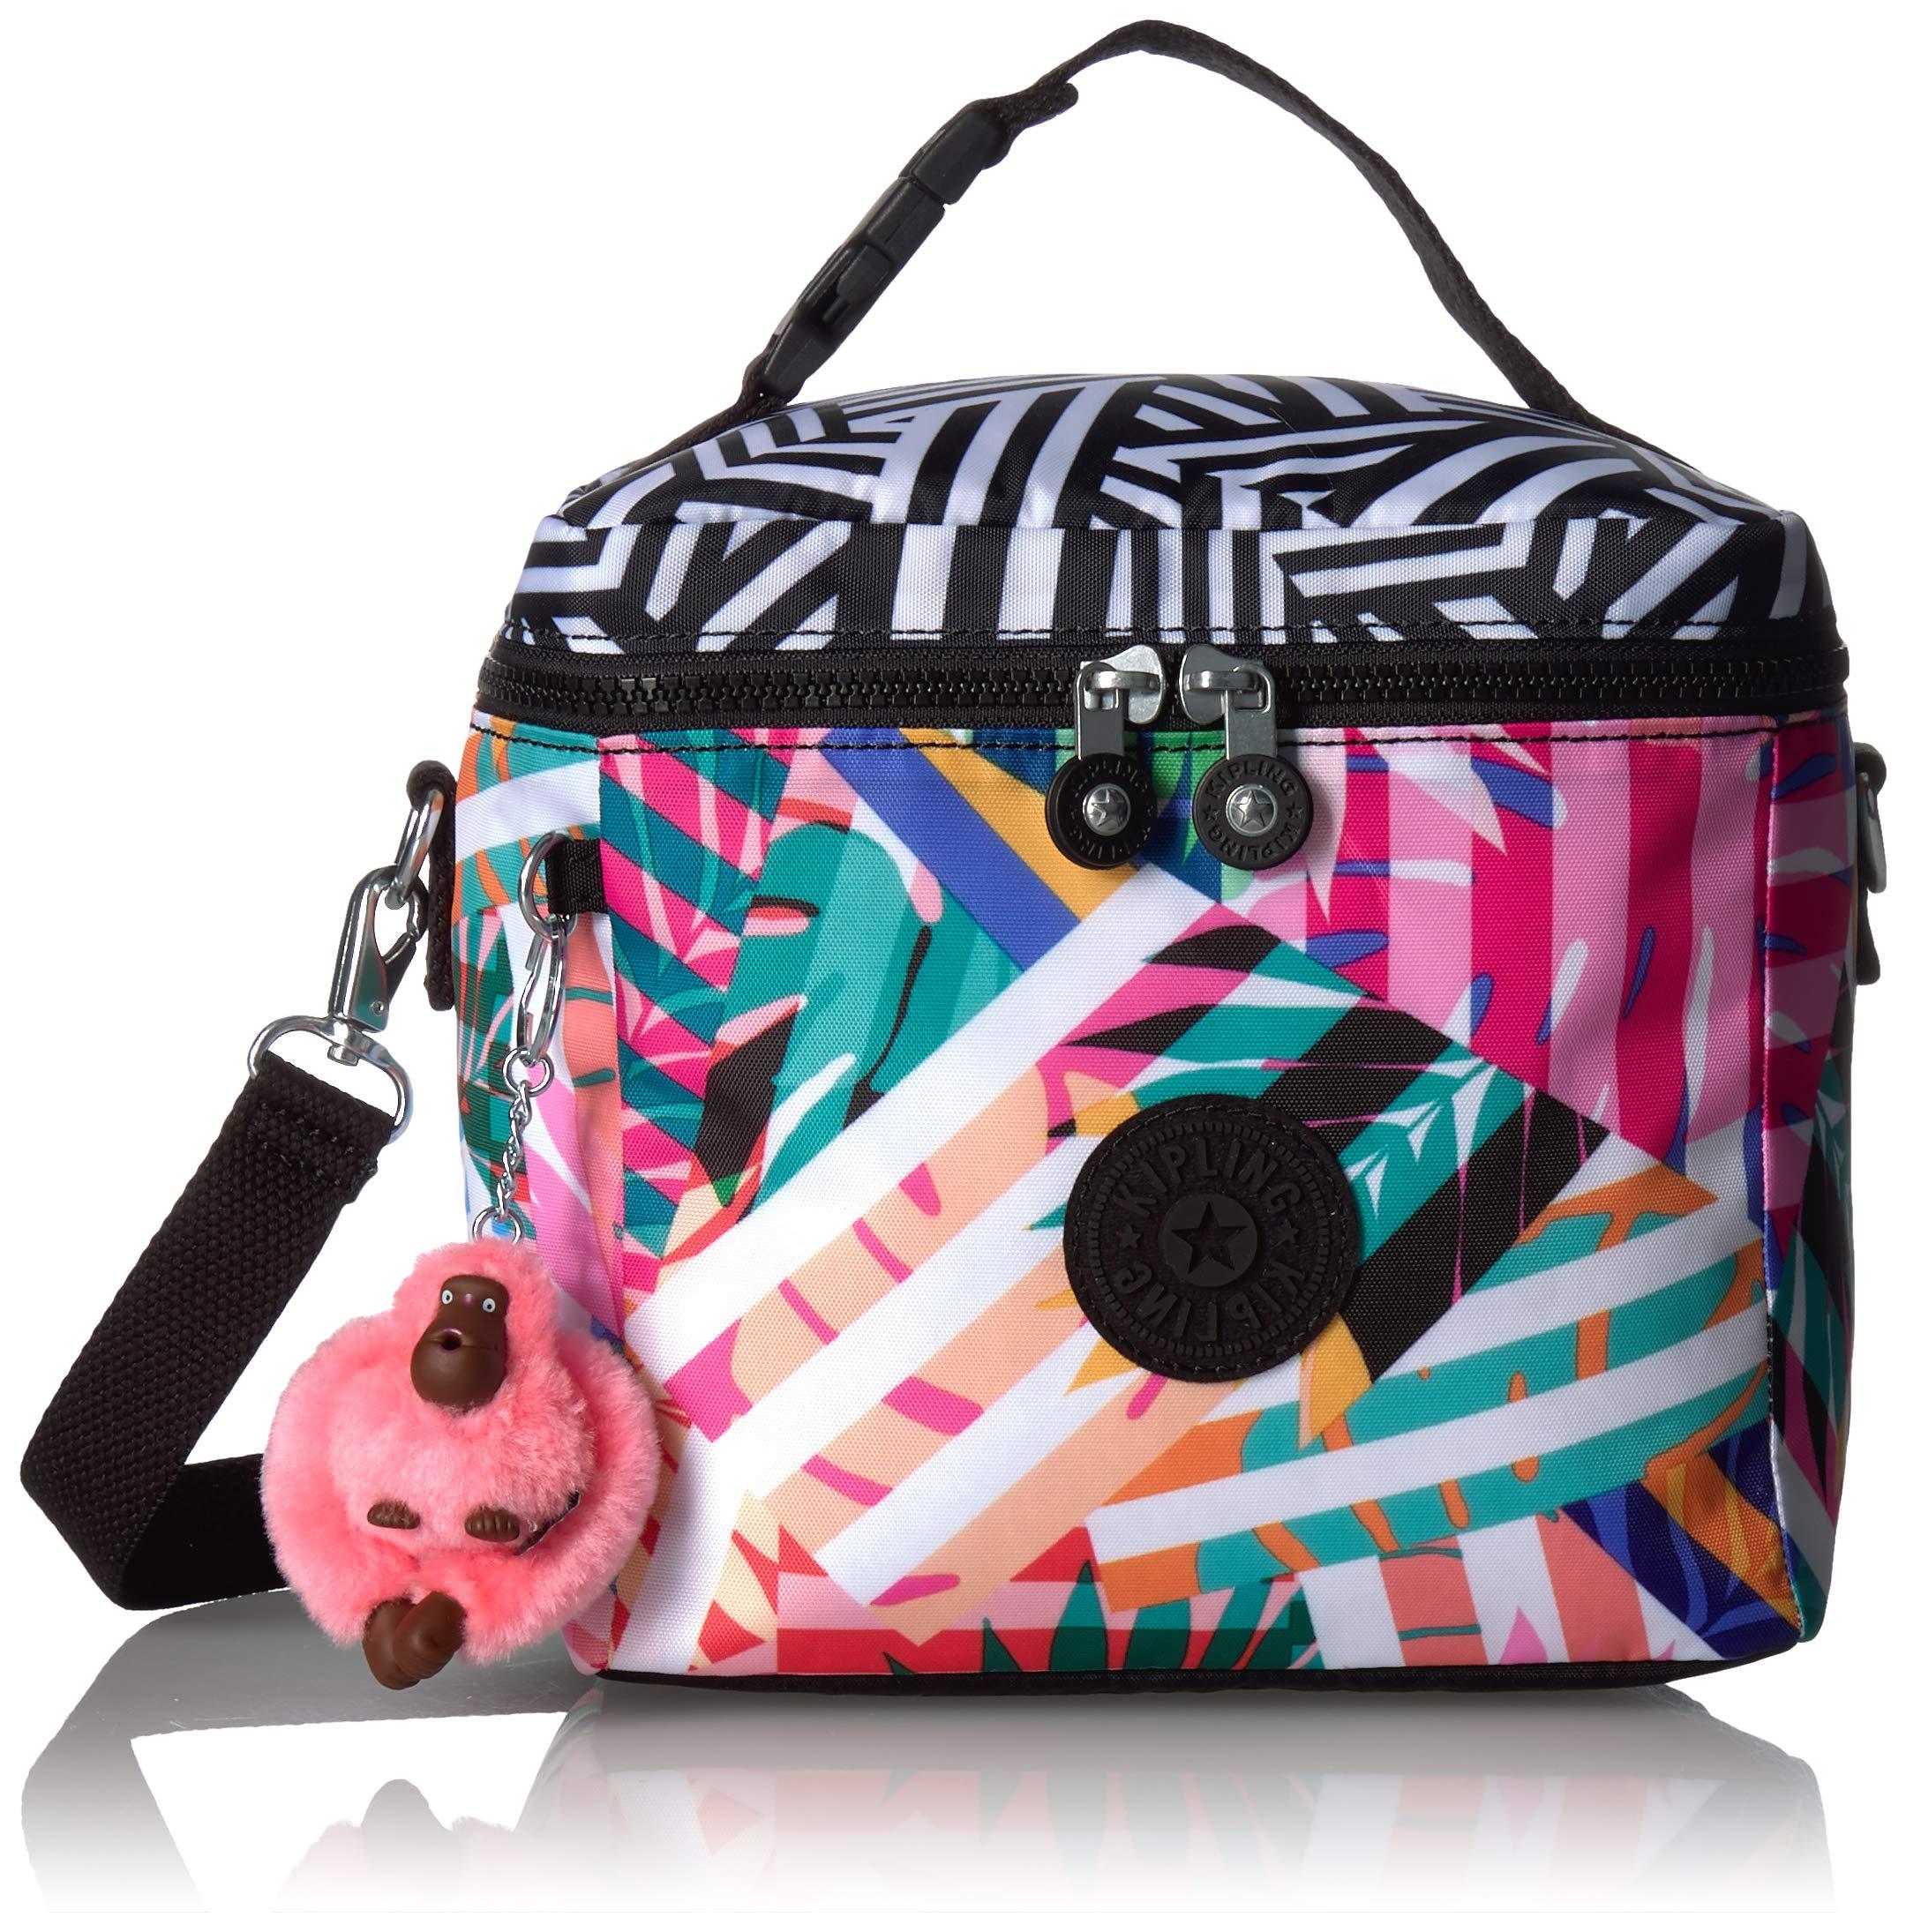 Kipling Graham Insulated Lunch Bag, Adjustable Crossbody Strap, Zip Closure, Black Print Combo